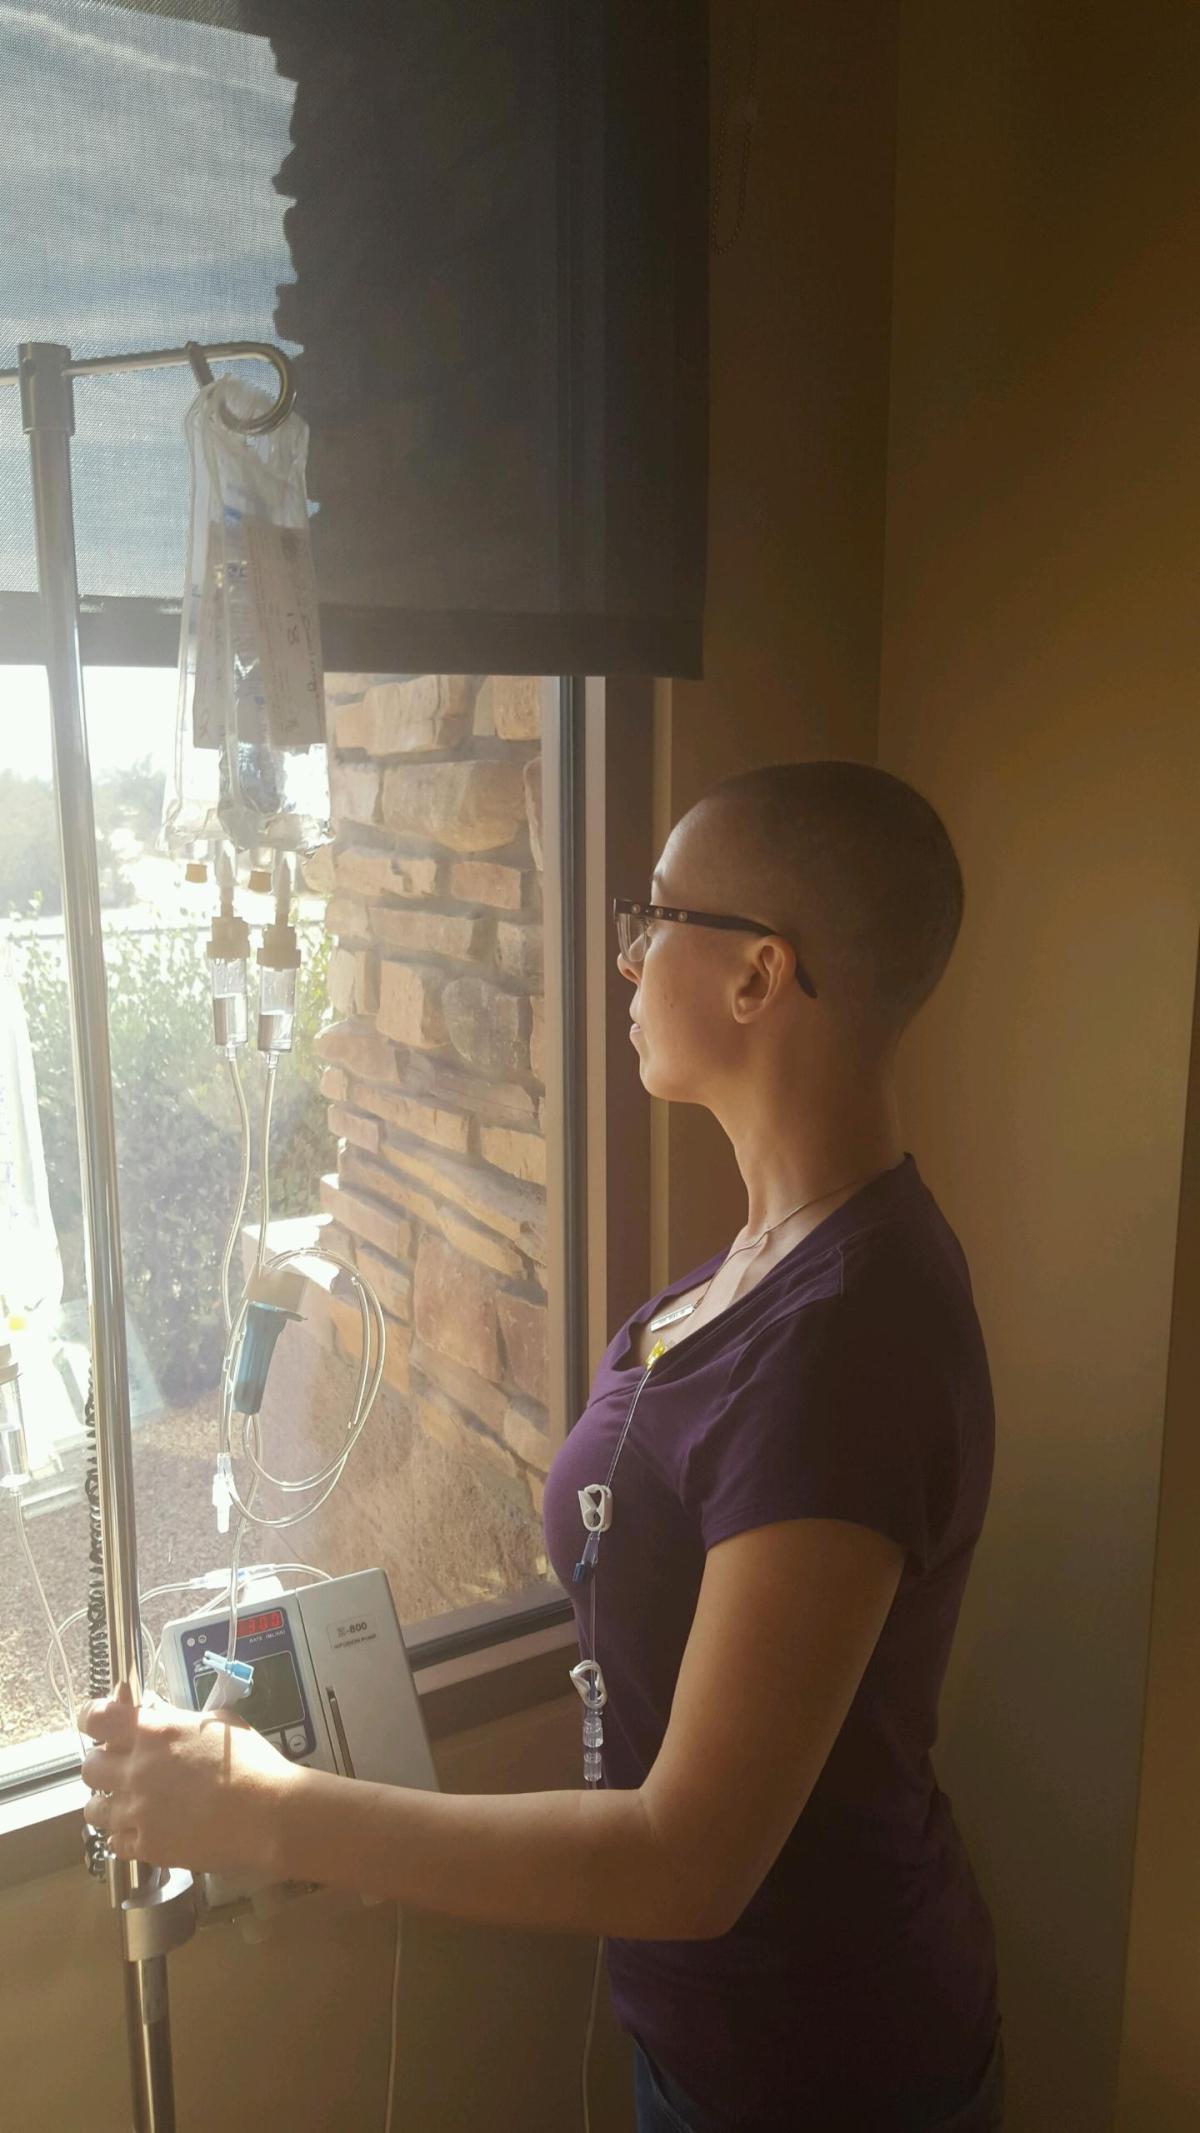 (16-01-29) Chemo Session#3